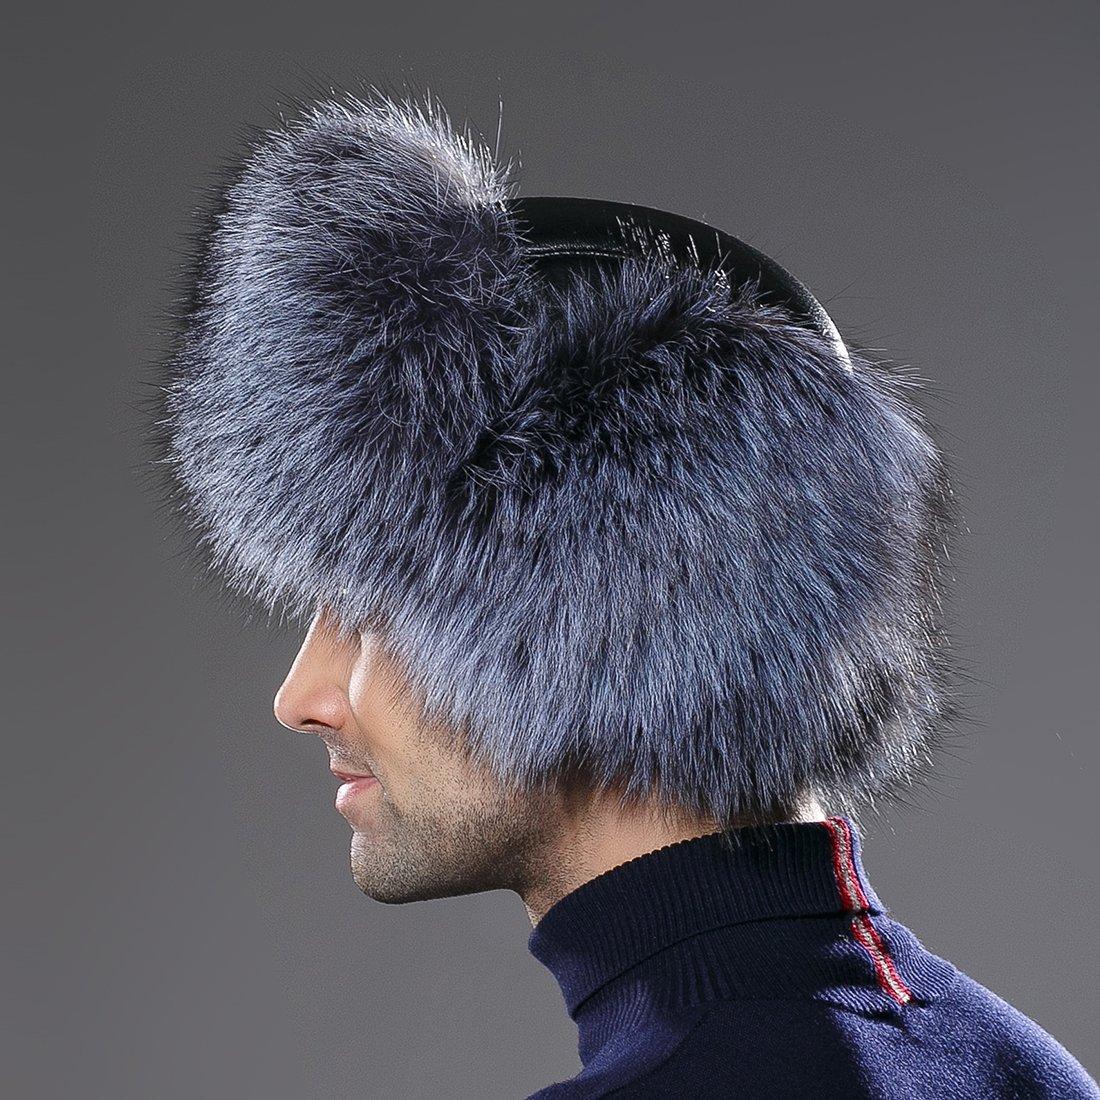 URSFUR Winter Mens Trapper Hat Real Leather Silver Fox Fur Russian Ushanka Cap by URSFUR (Image #5)